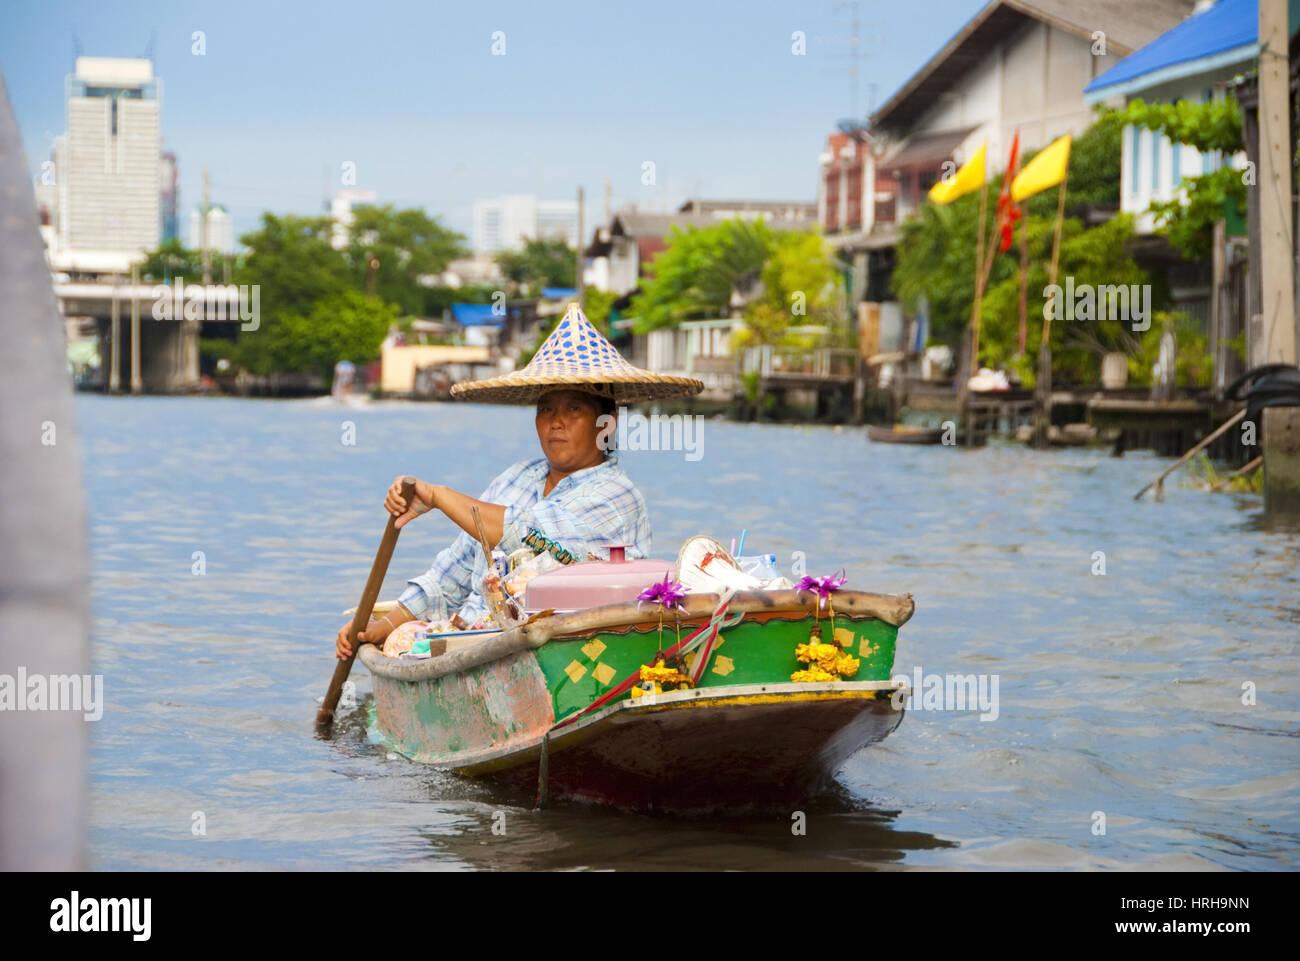 Frau im Boot, Bangkok, Thailand - Bangkok, Thailand - Stock Image